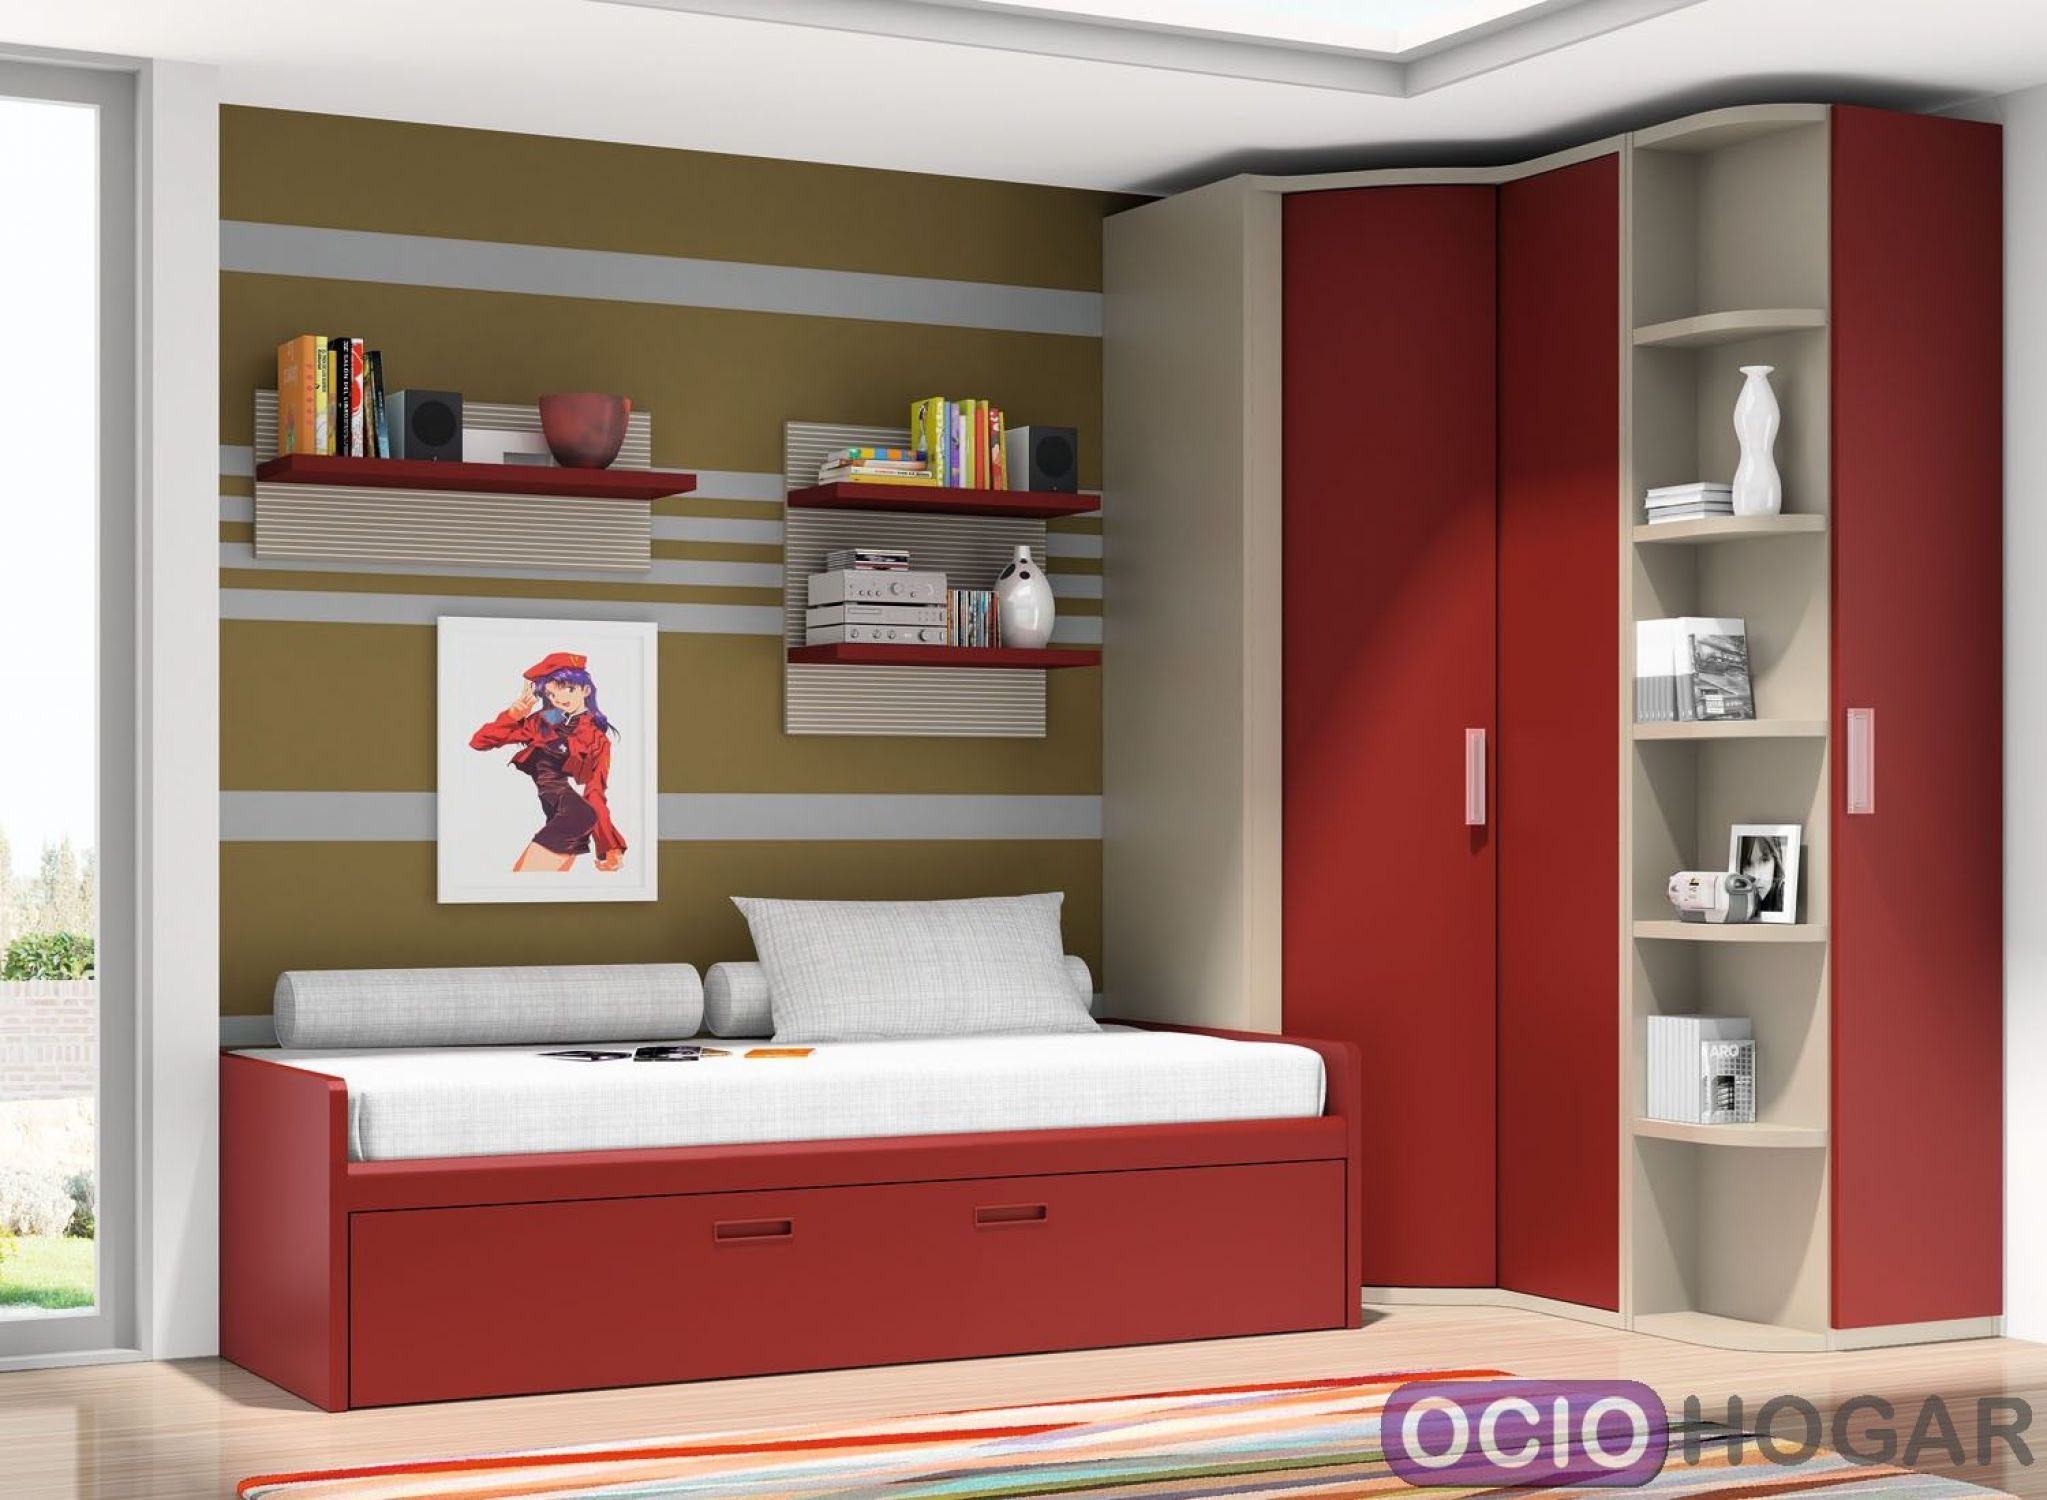 Dormitorio juvenil cabernet dissery muebles juveniles Dormitorio juvenil en l